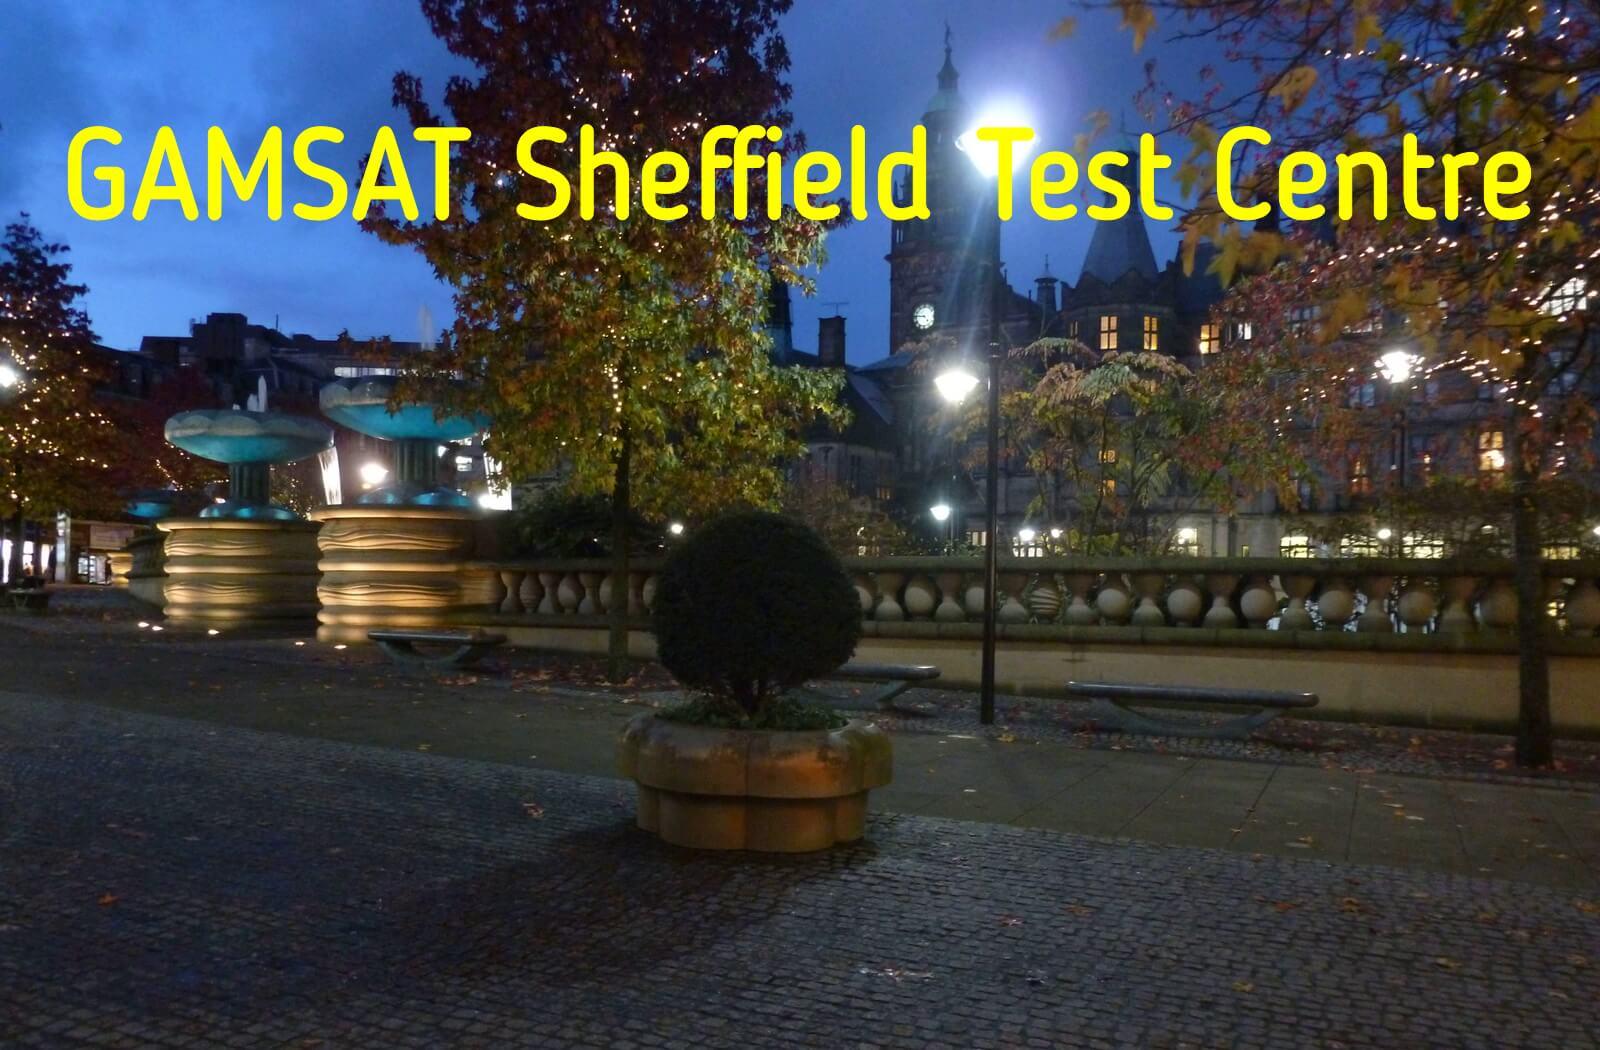 Where is GAMSAT held in Sheffield?